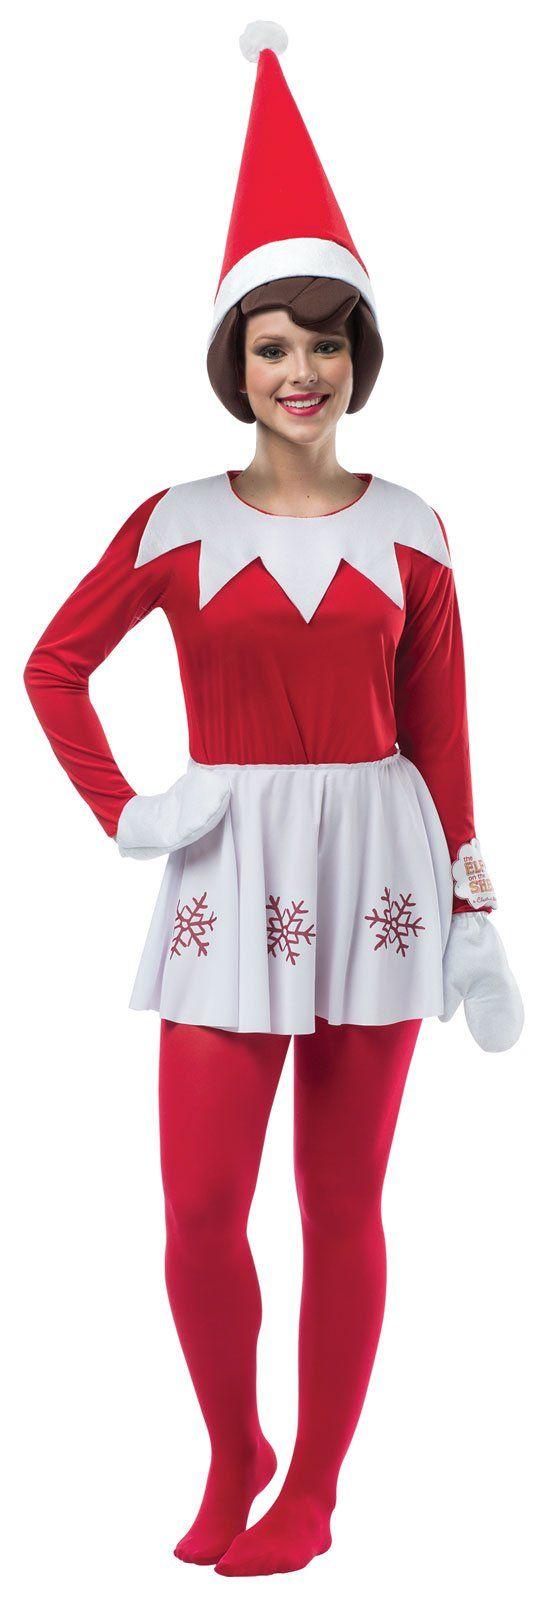 Womens Elf on the Shelf Dress Costume from CostumeExpress.com